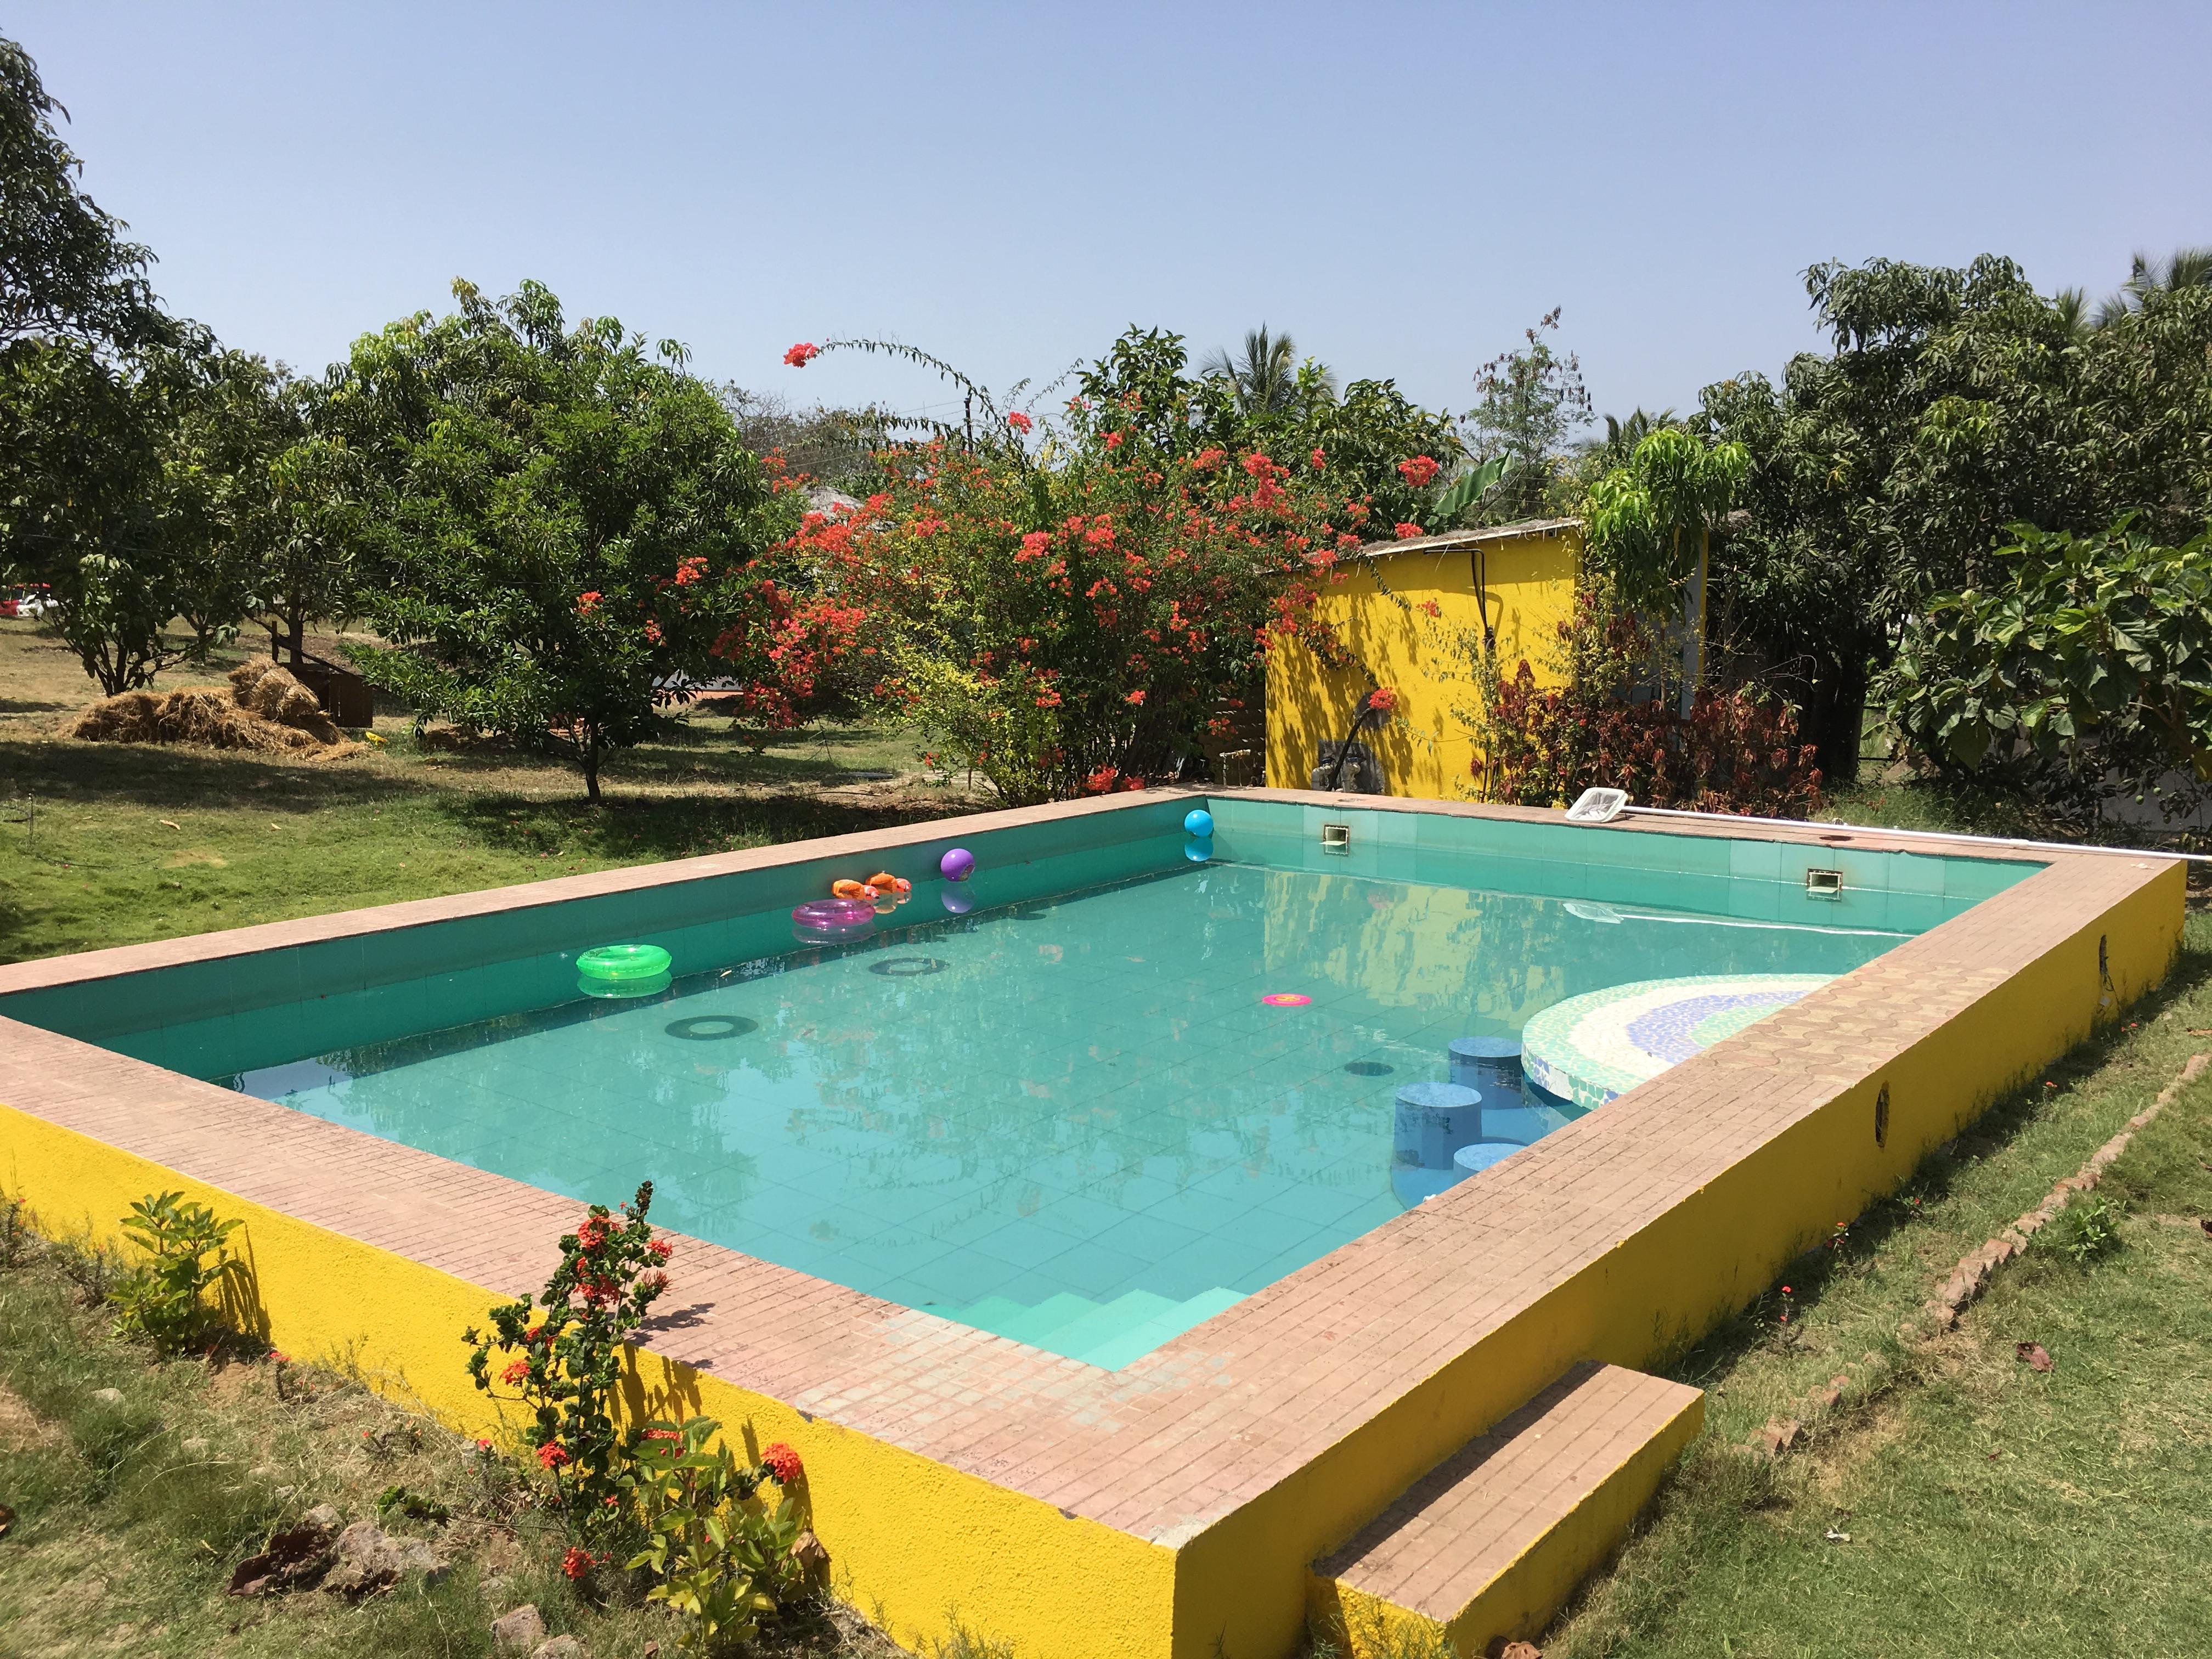 Cob 5, Karjat, Mumbai, India